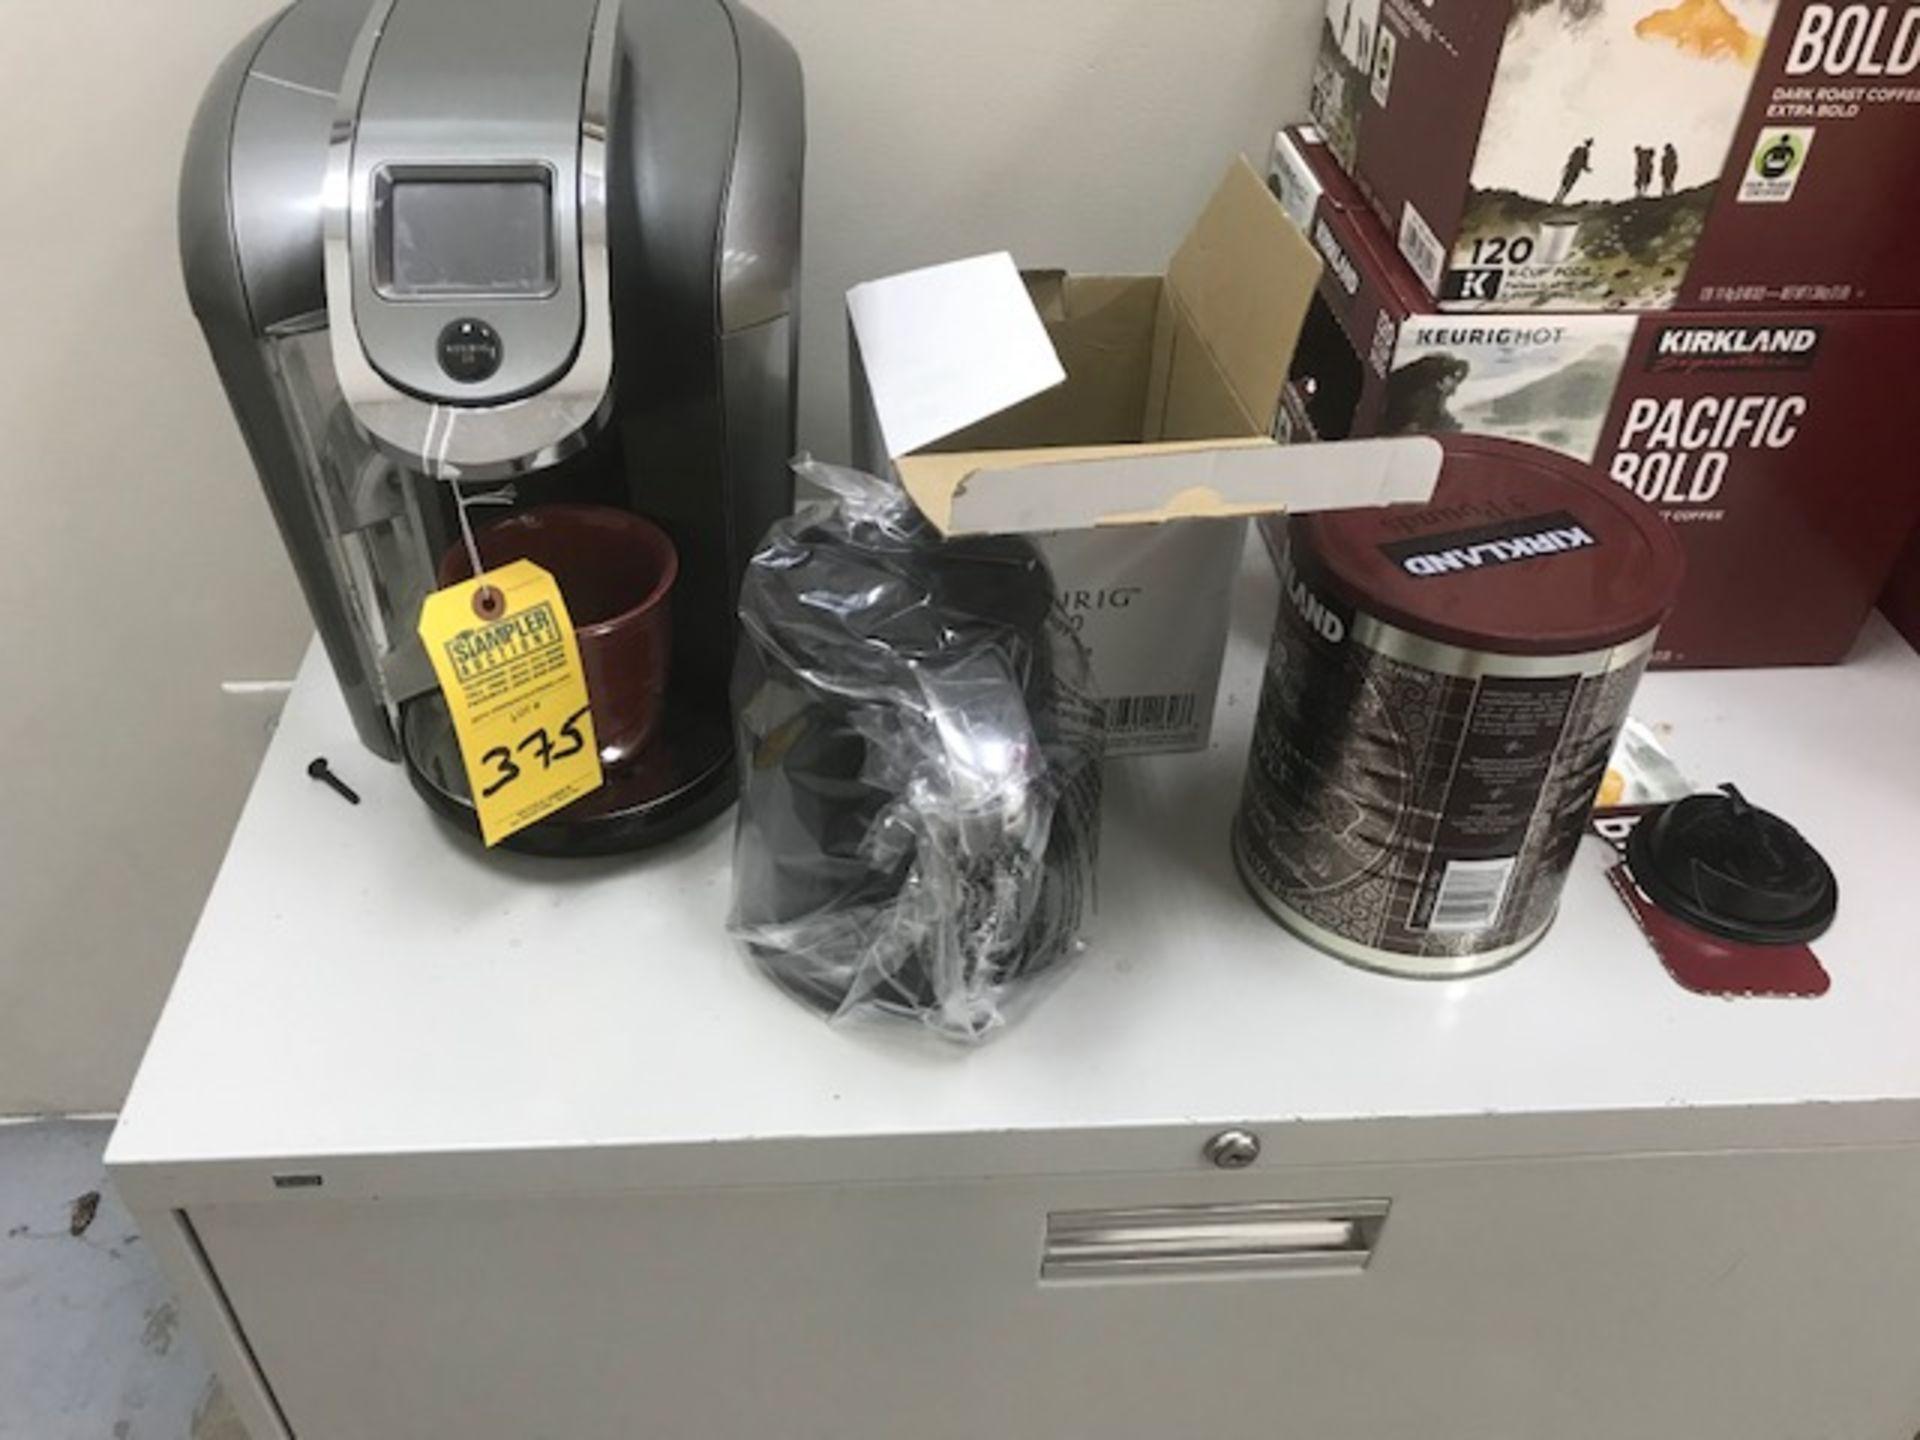 Lot 375 - KEURIG 2.0 COFFEE MACHINE WITH CARAFE